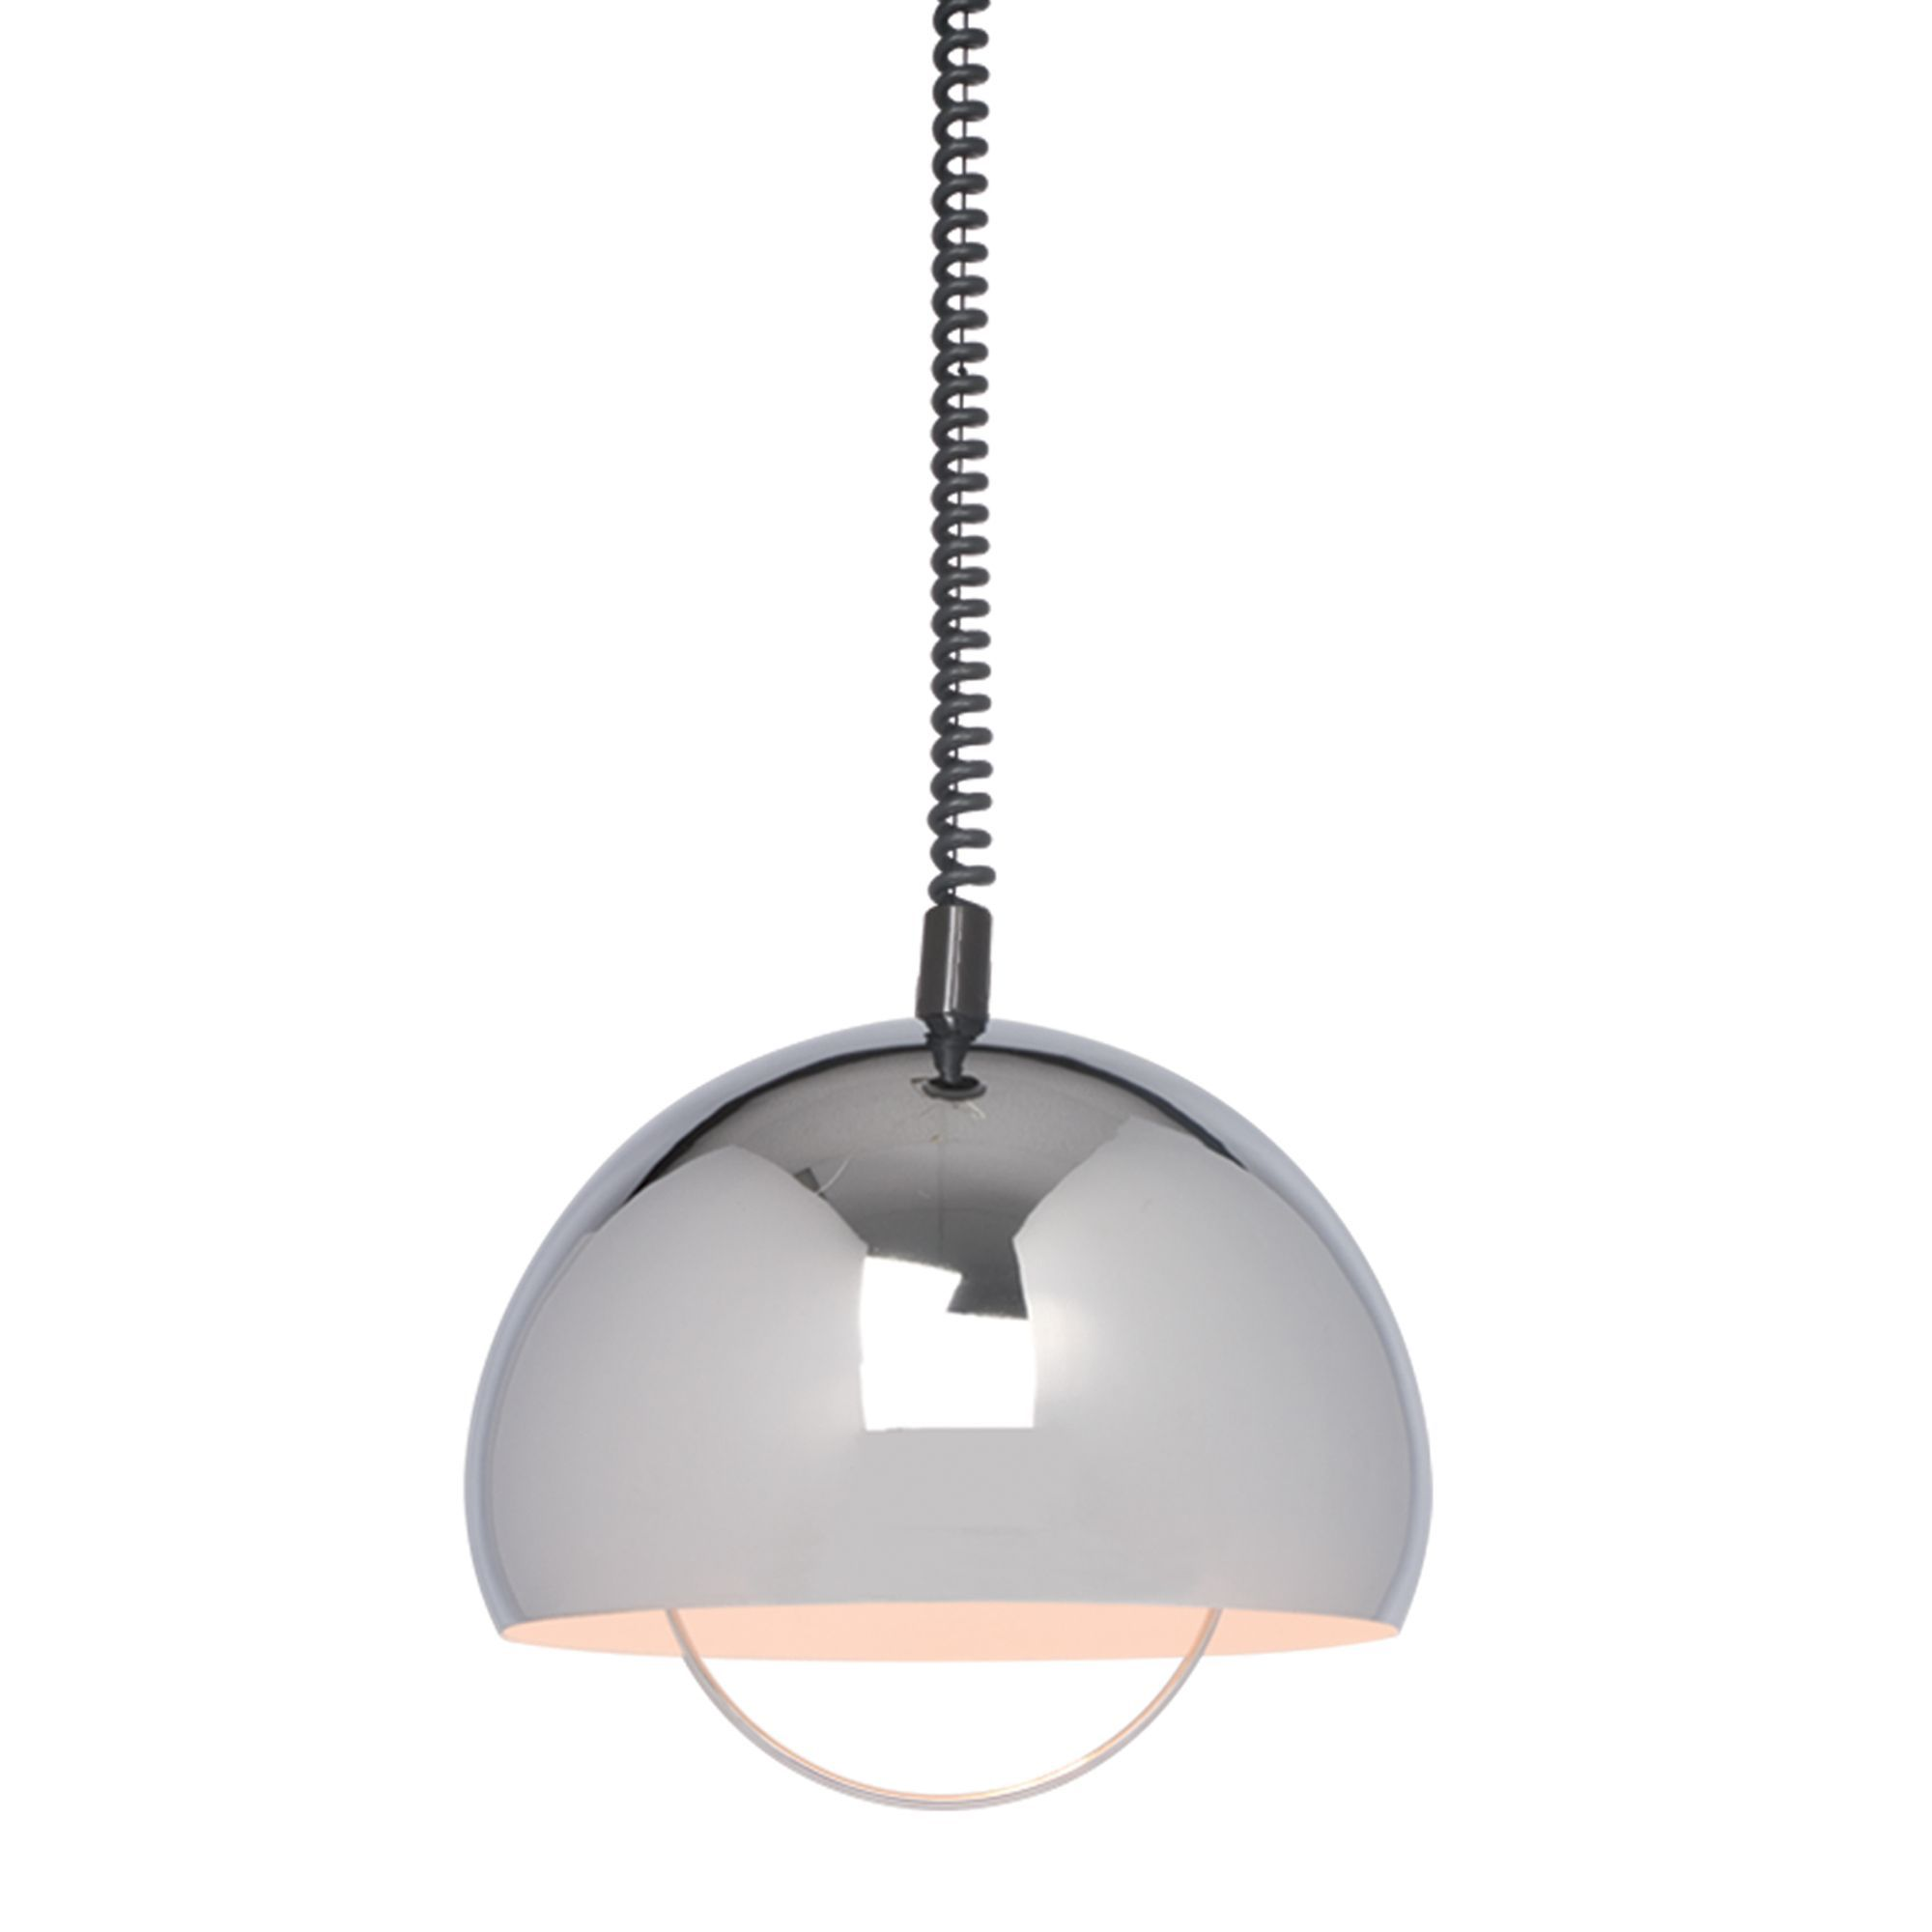 Diy at bq zodiac dome chrome effect pendant ceiling light arubaitofo Gallery